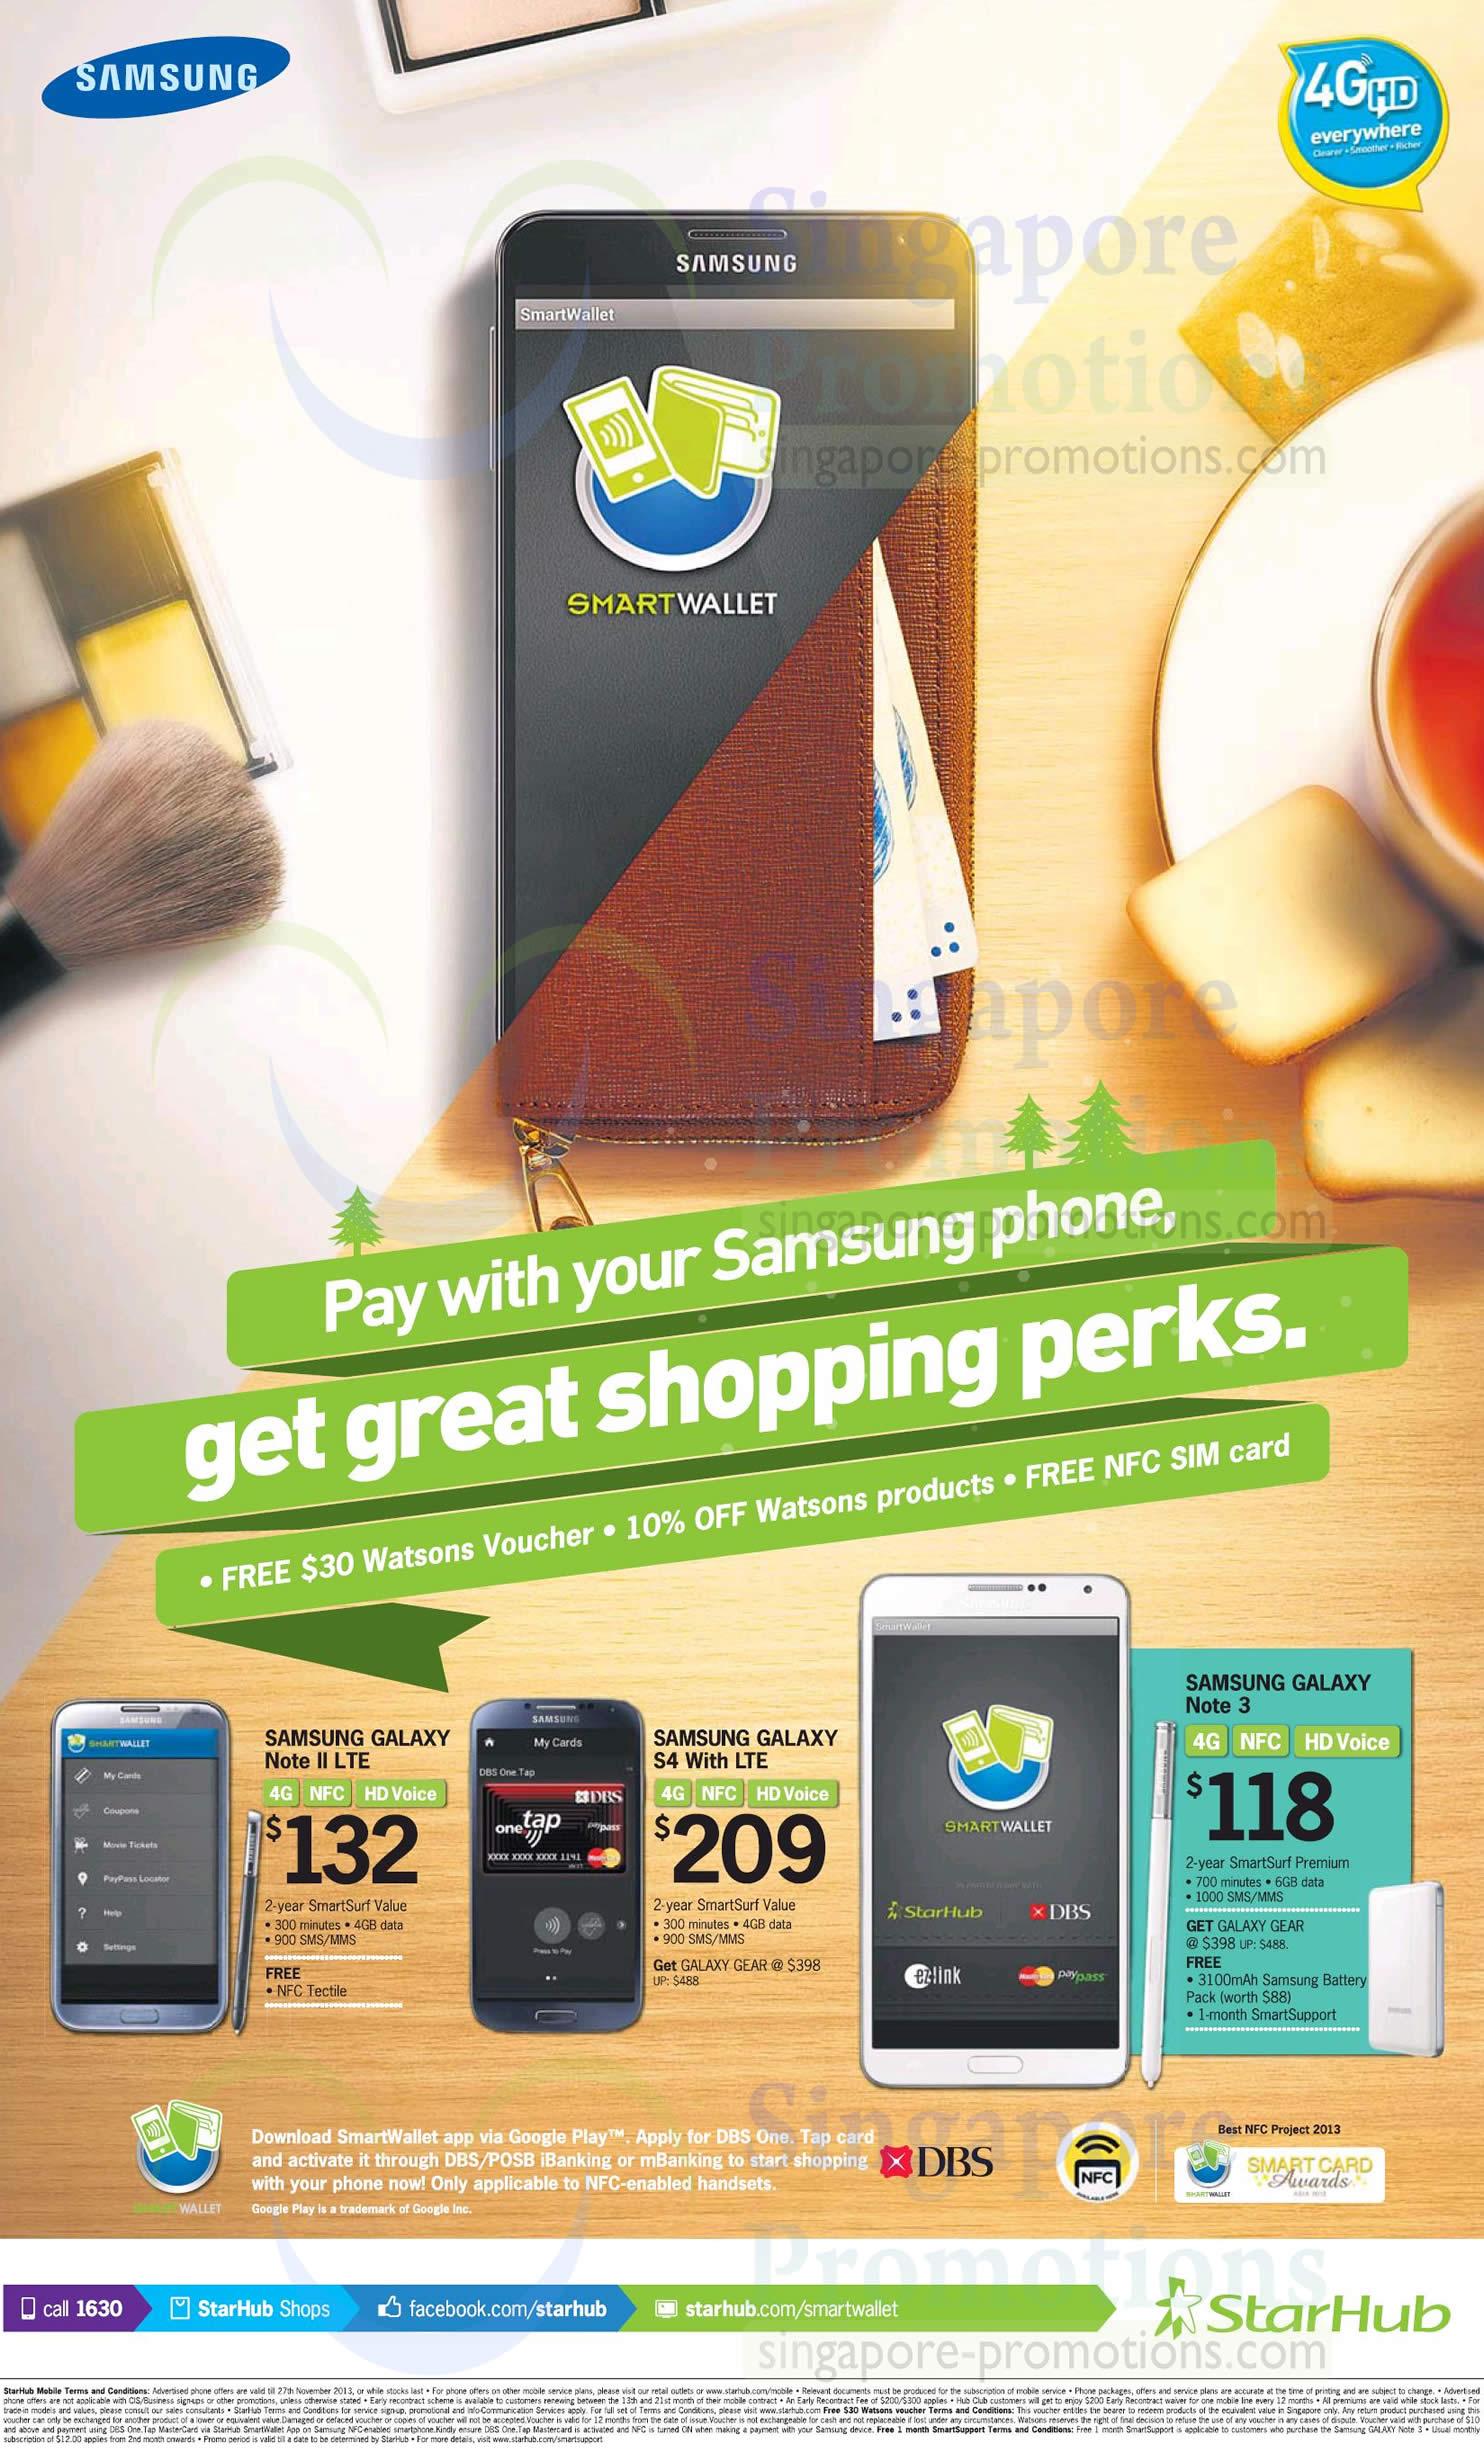 Samsung Galaxy Note II LTE, S4, Note 3